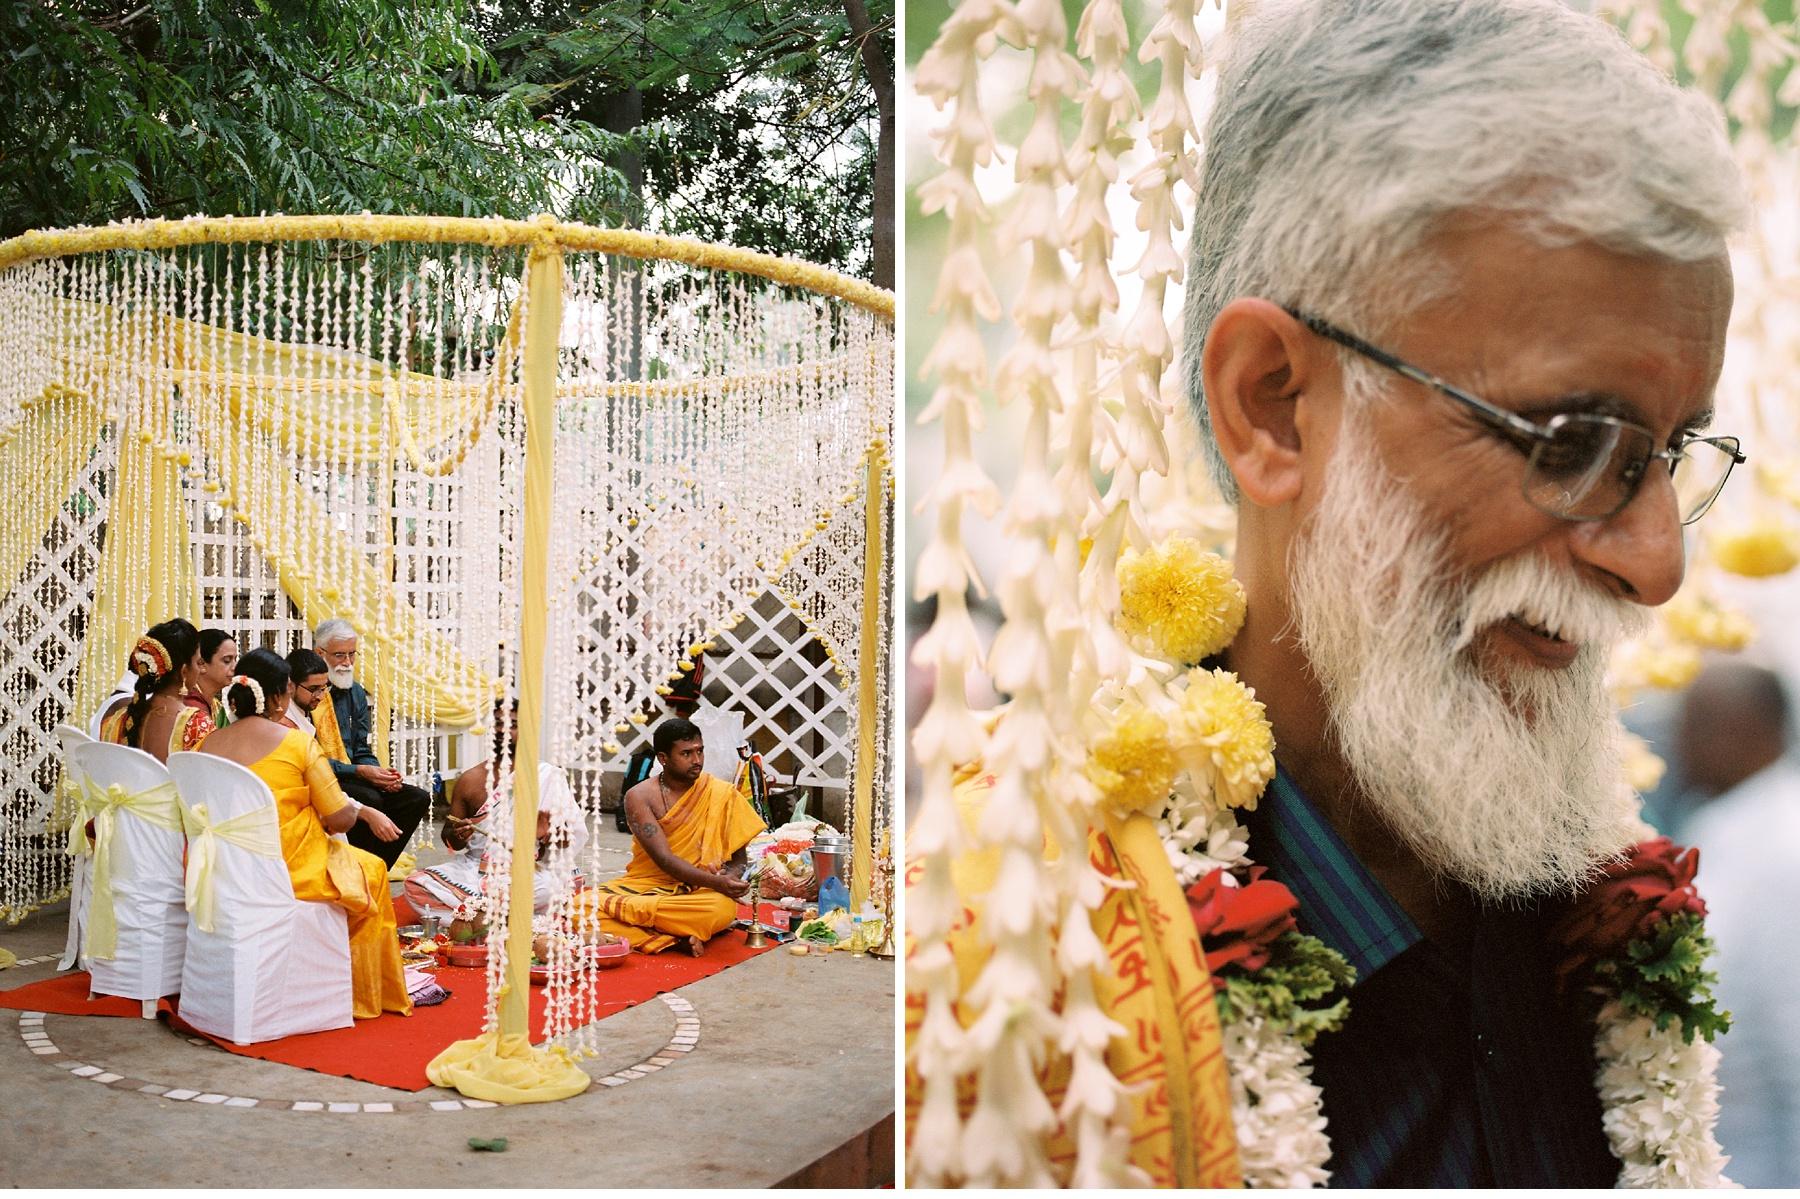 Southern_India_Wedding_Ceremony_0004.jpg